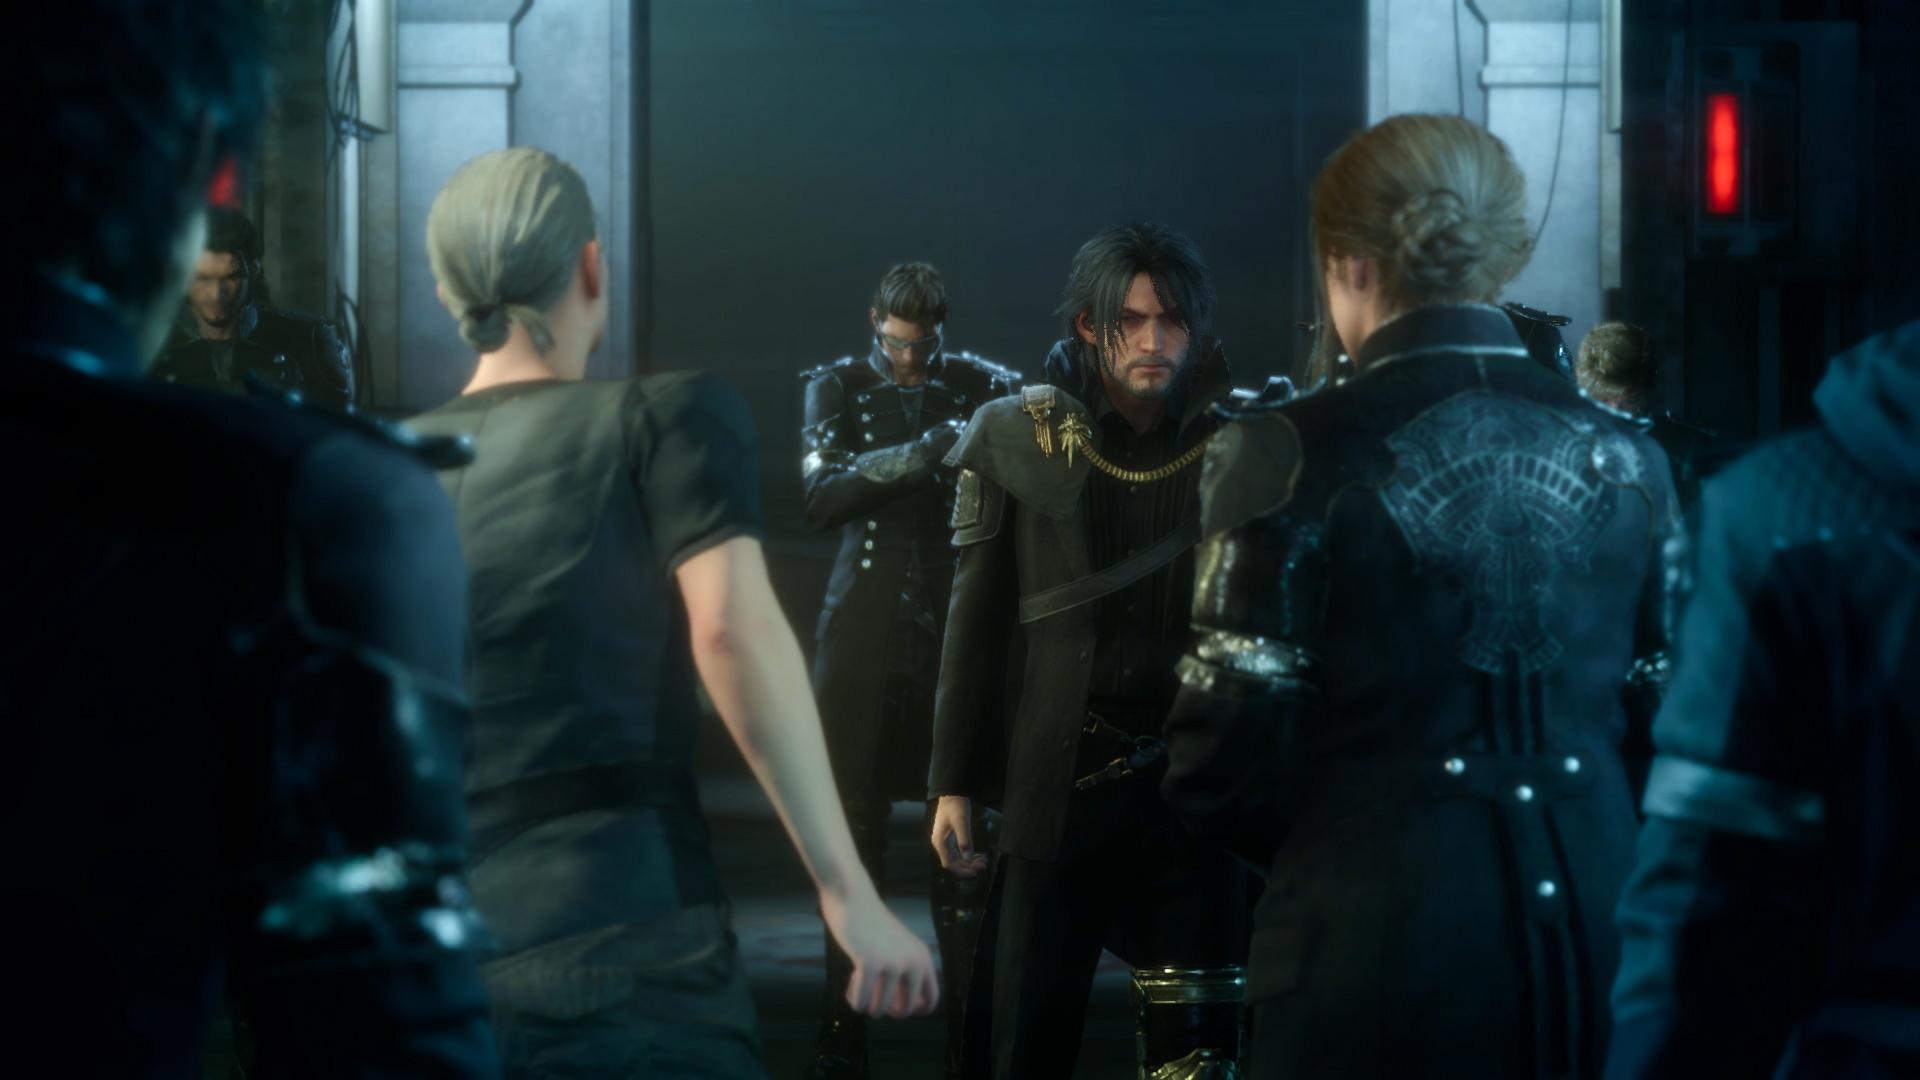 4k Noctis Lucis Caelum Final Fantasy Xv Hd Games 4k: Final Fantasy XV Royal Edition Announced